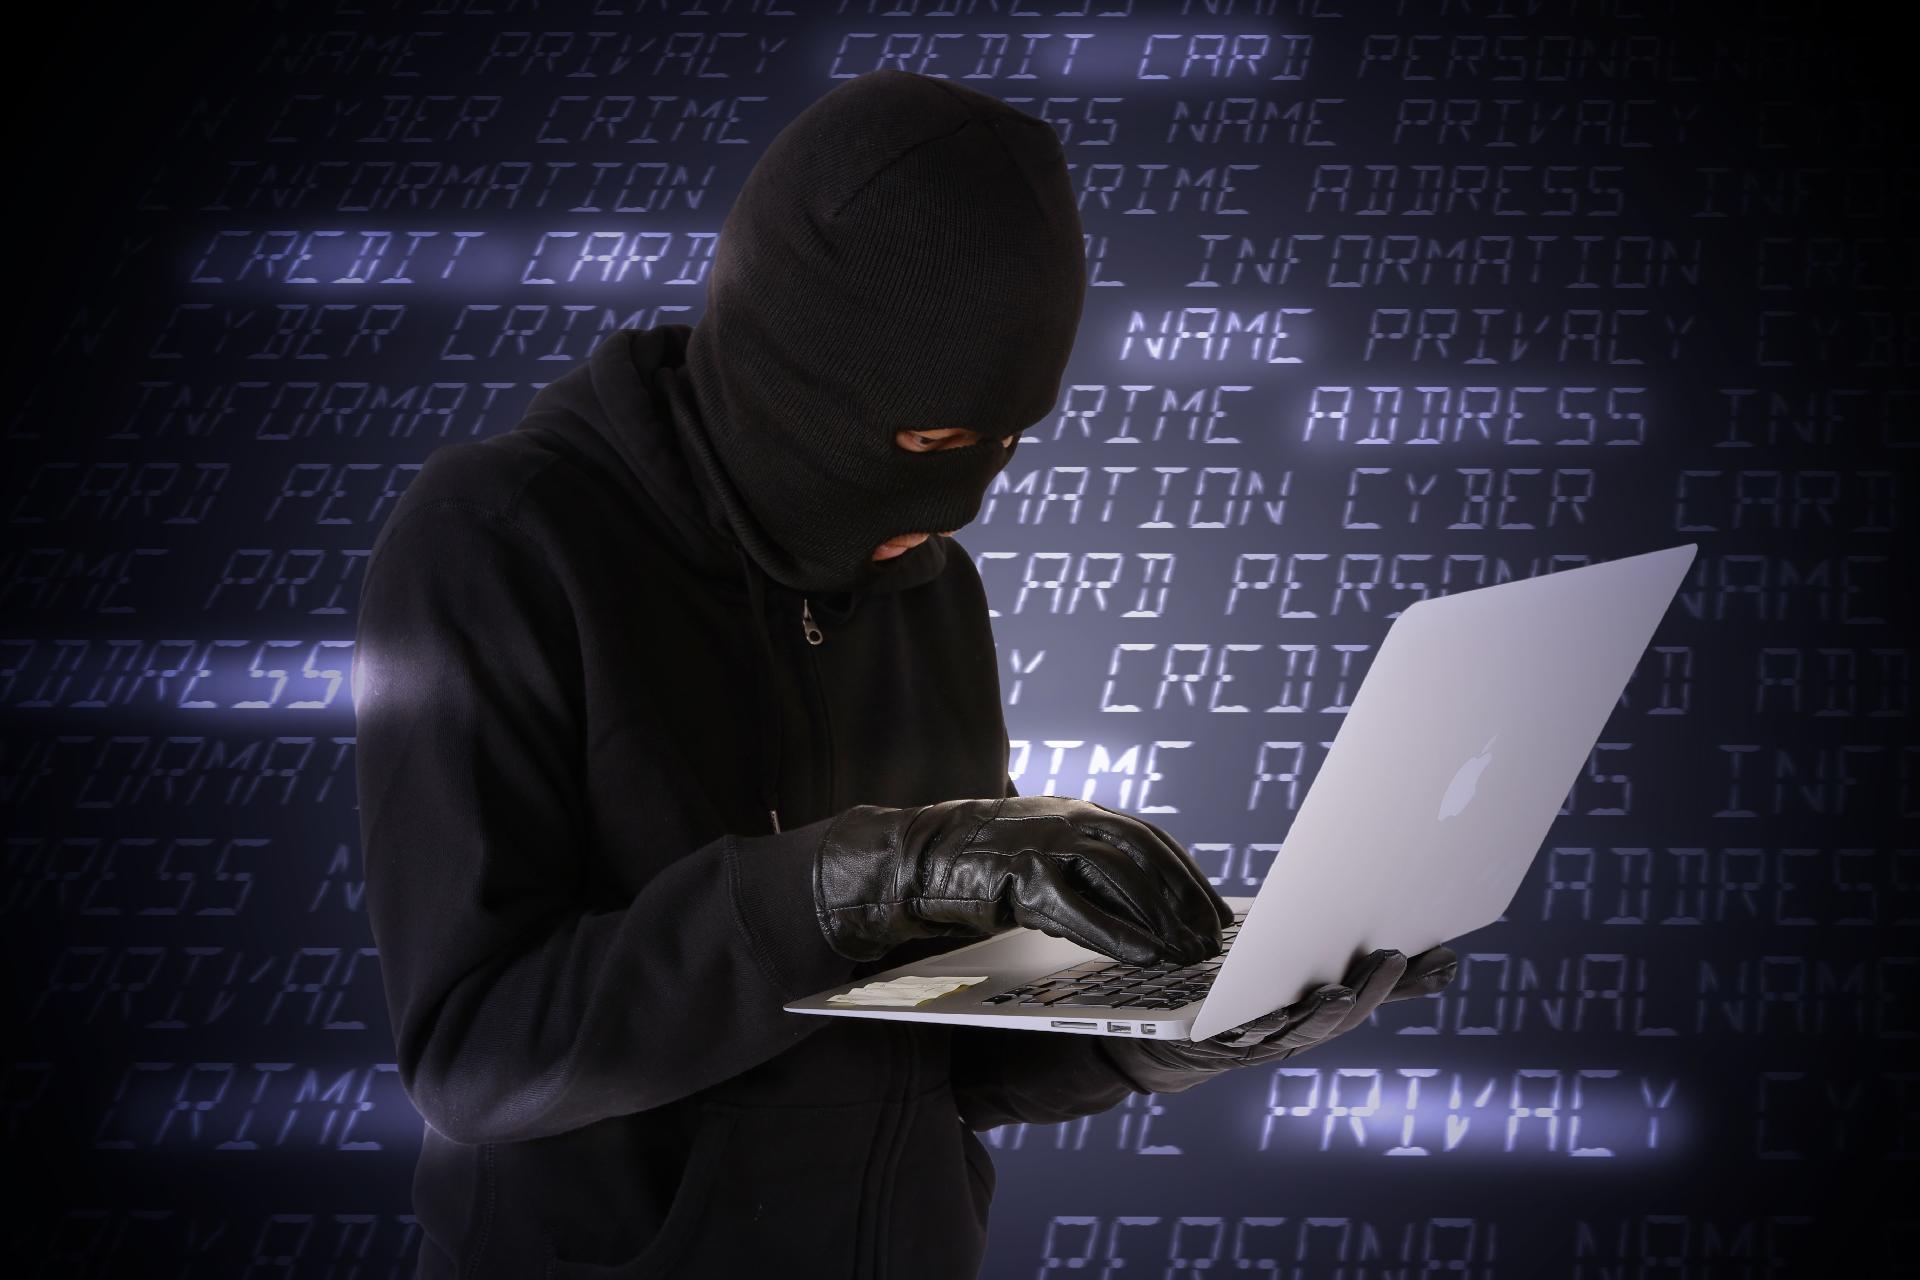 cracker hacker cyber 攻撃 侵入